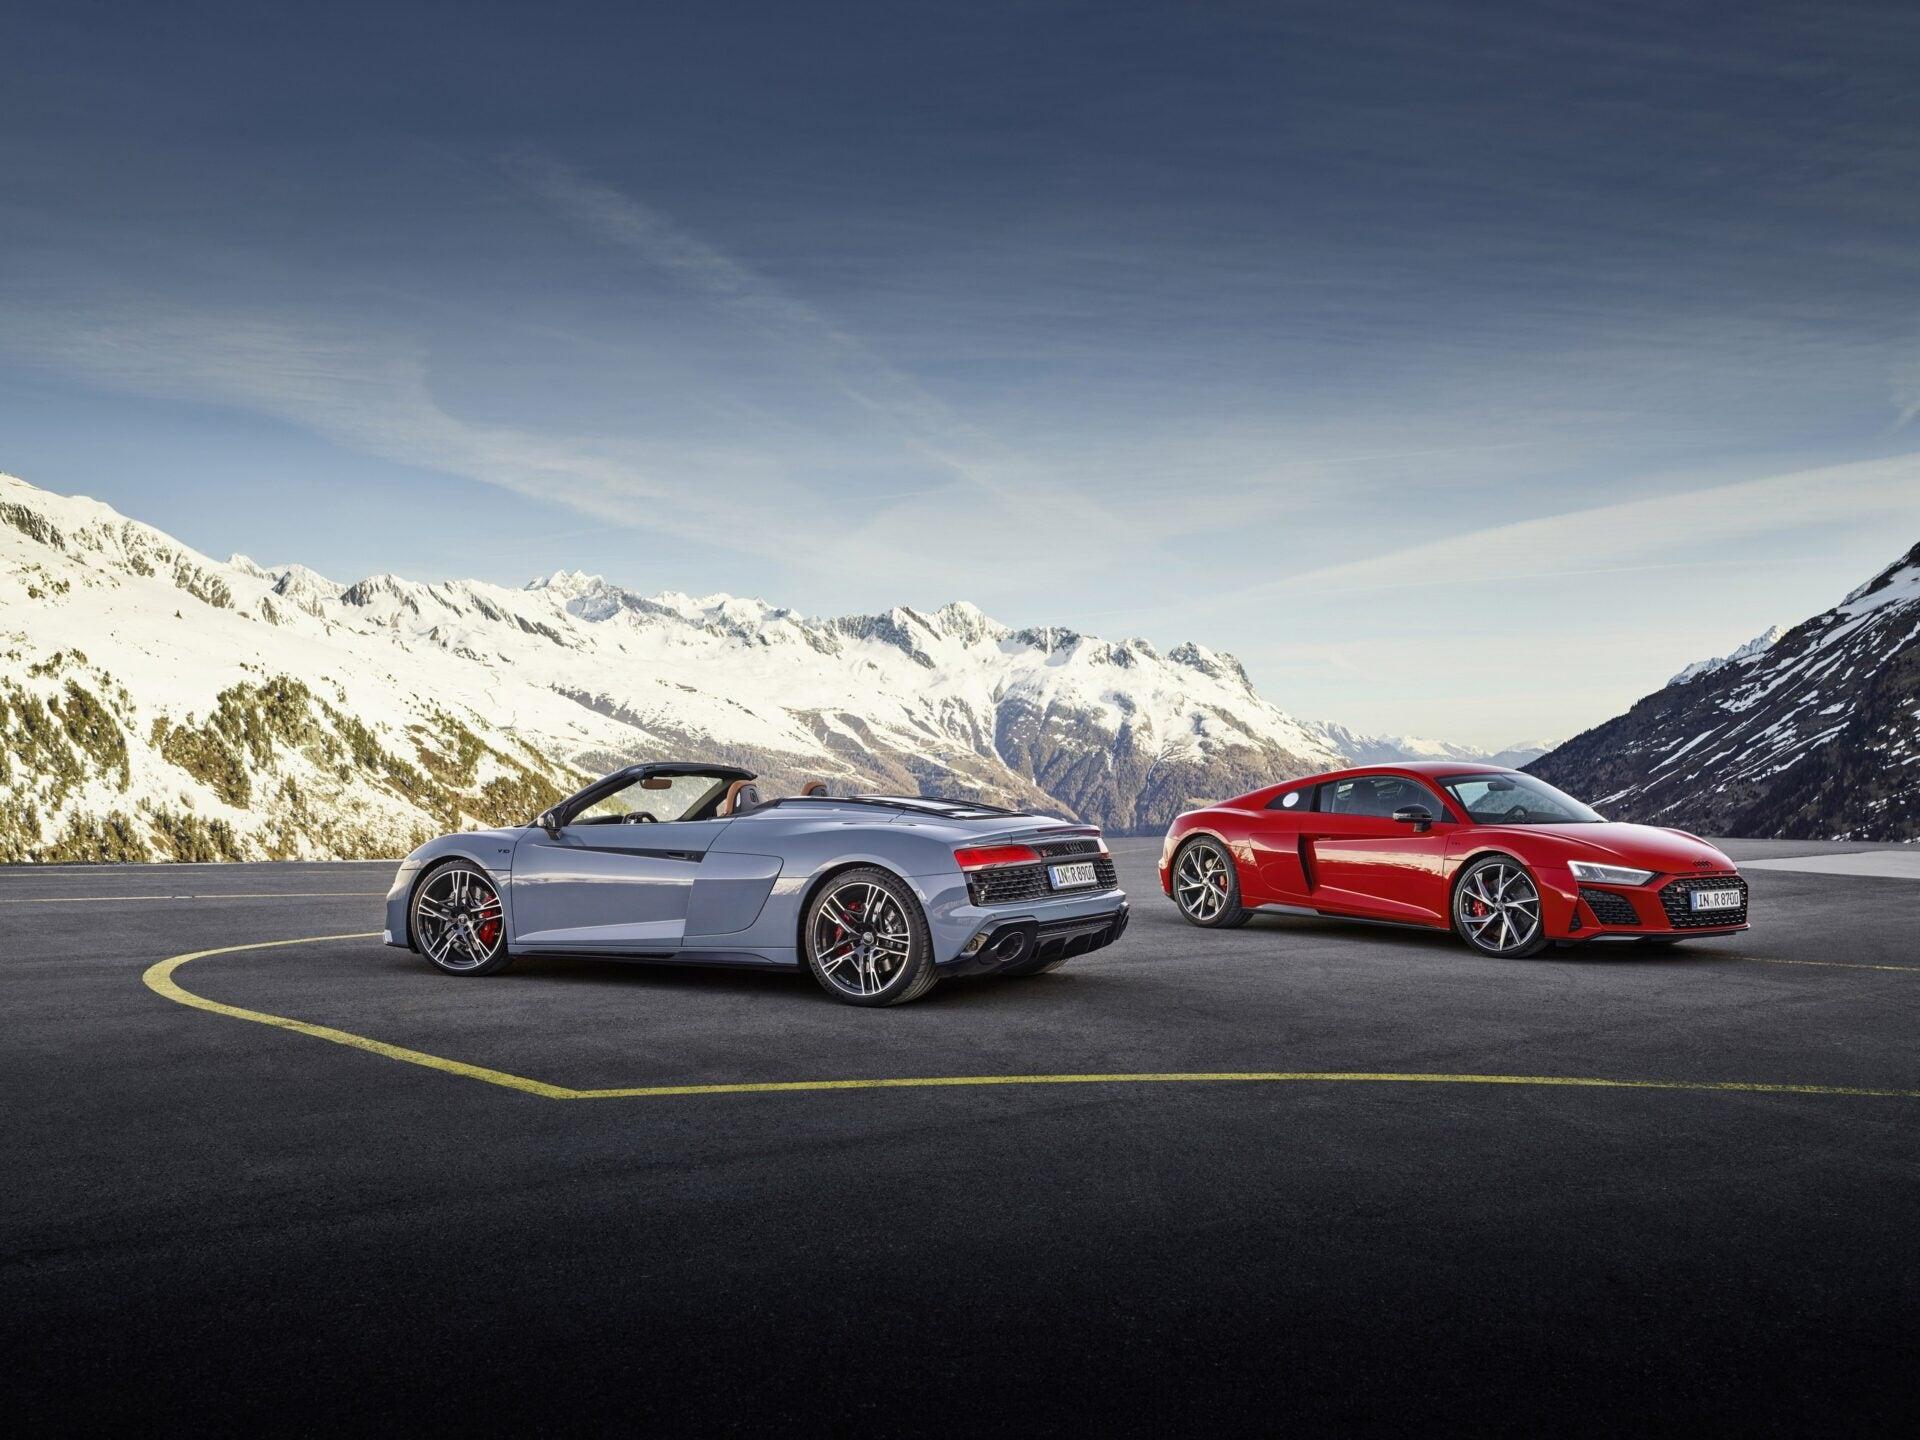 Audi R8 Performance RWD